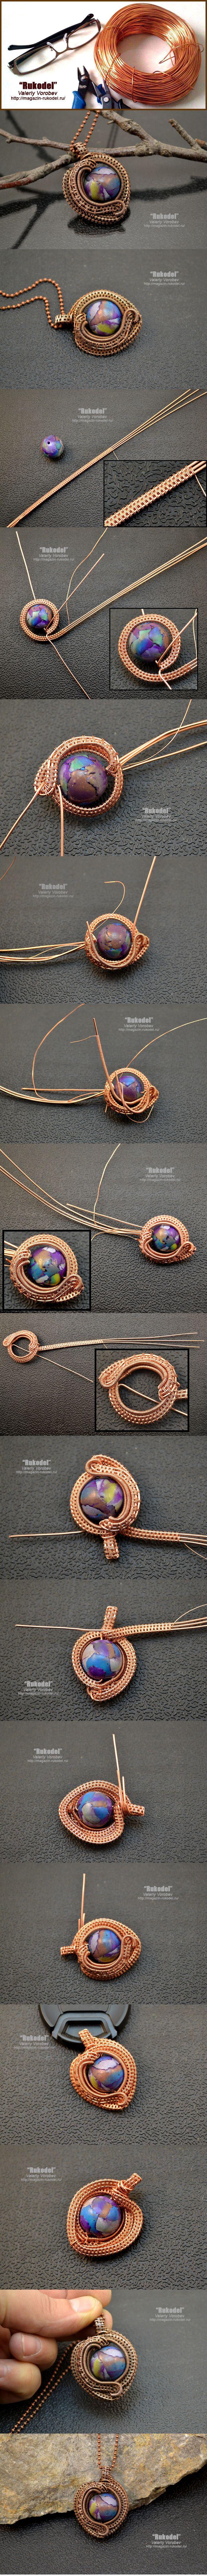 Wire Wrap Pendant - http://magazin-rukodel.ru/ #Wire #Jewelry #Tutorials